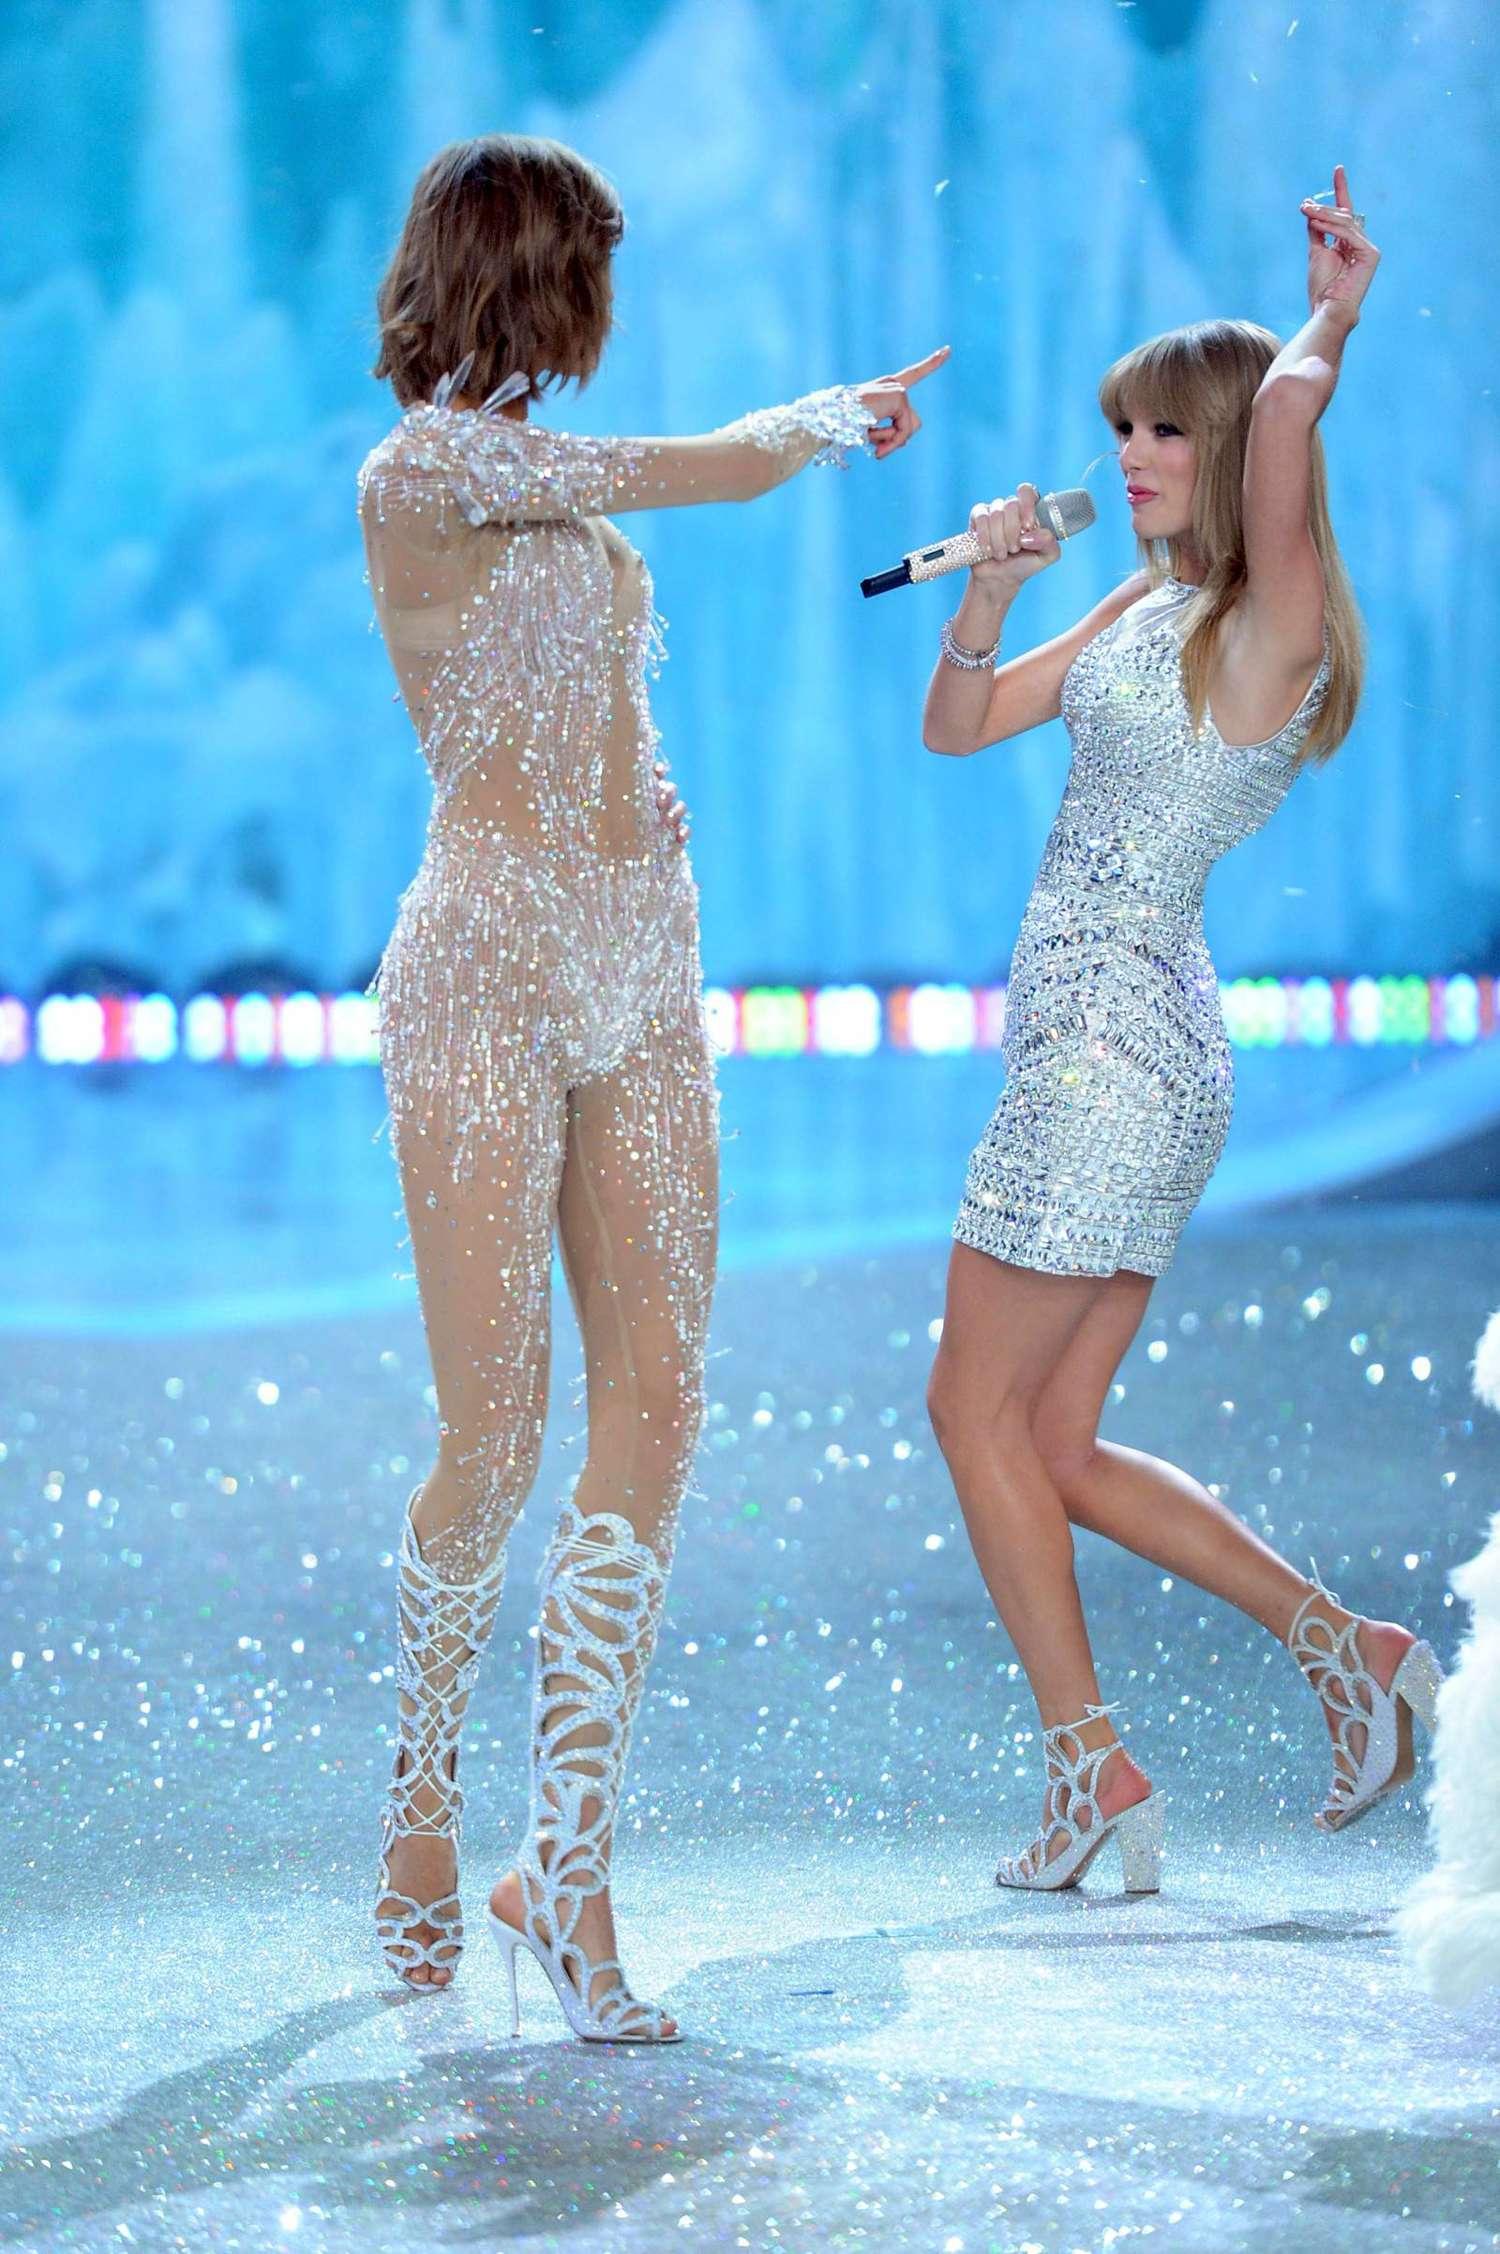 Taylor Swift 2013 Vs Fashion Show 06 Gotceleb